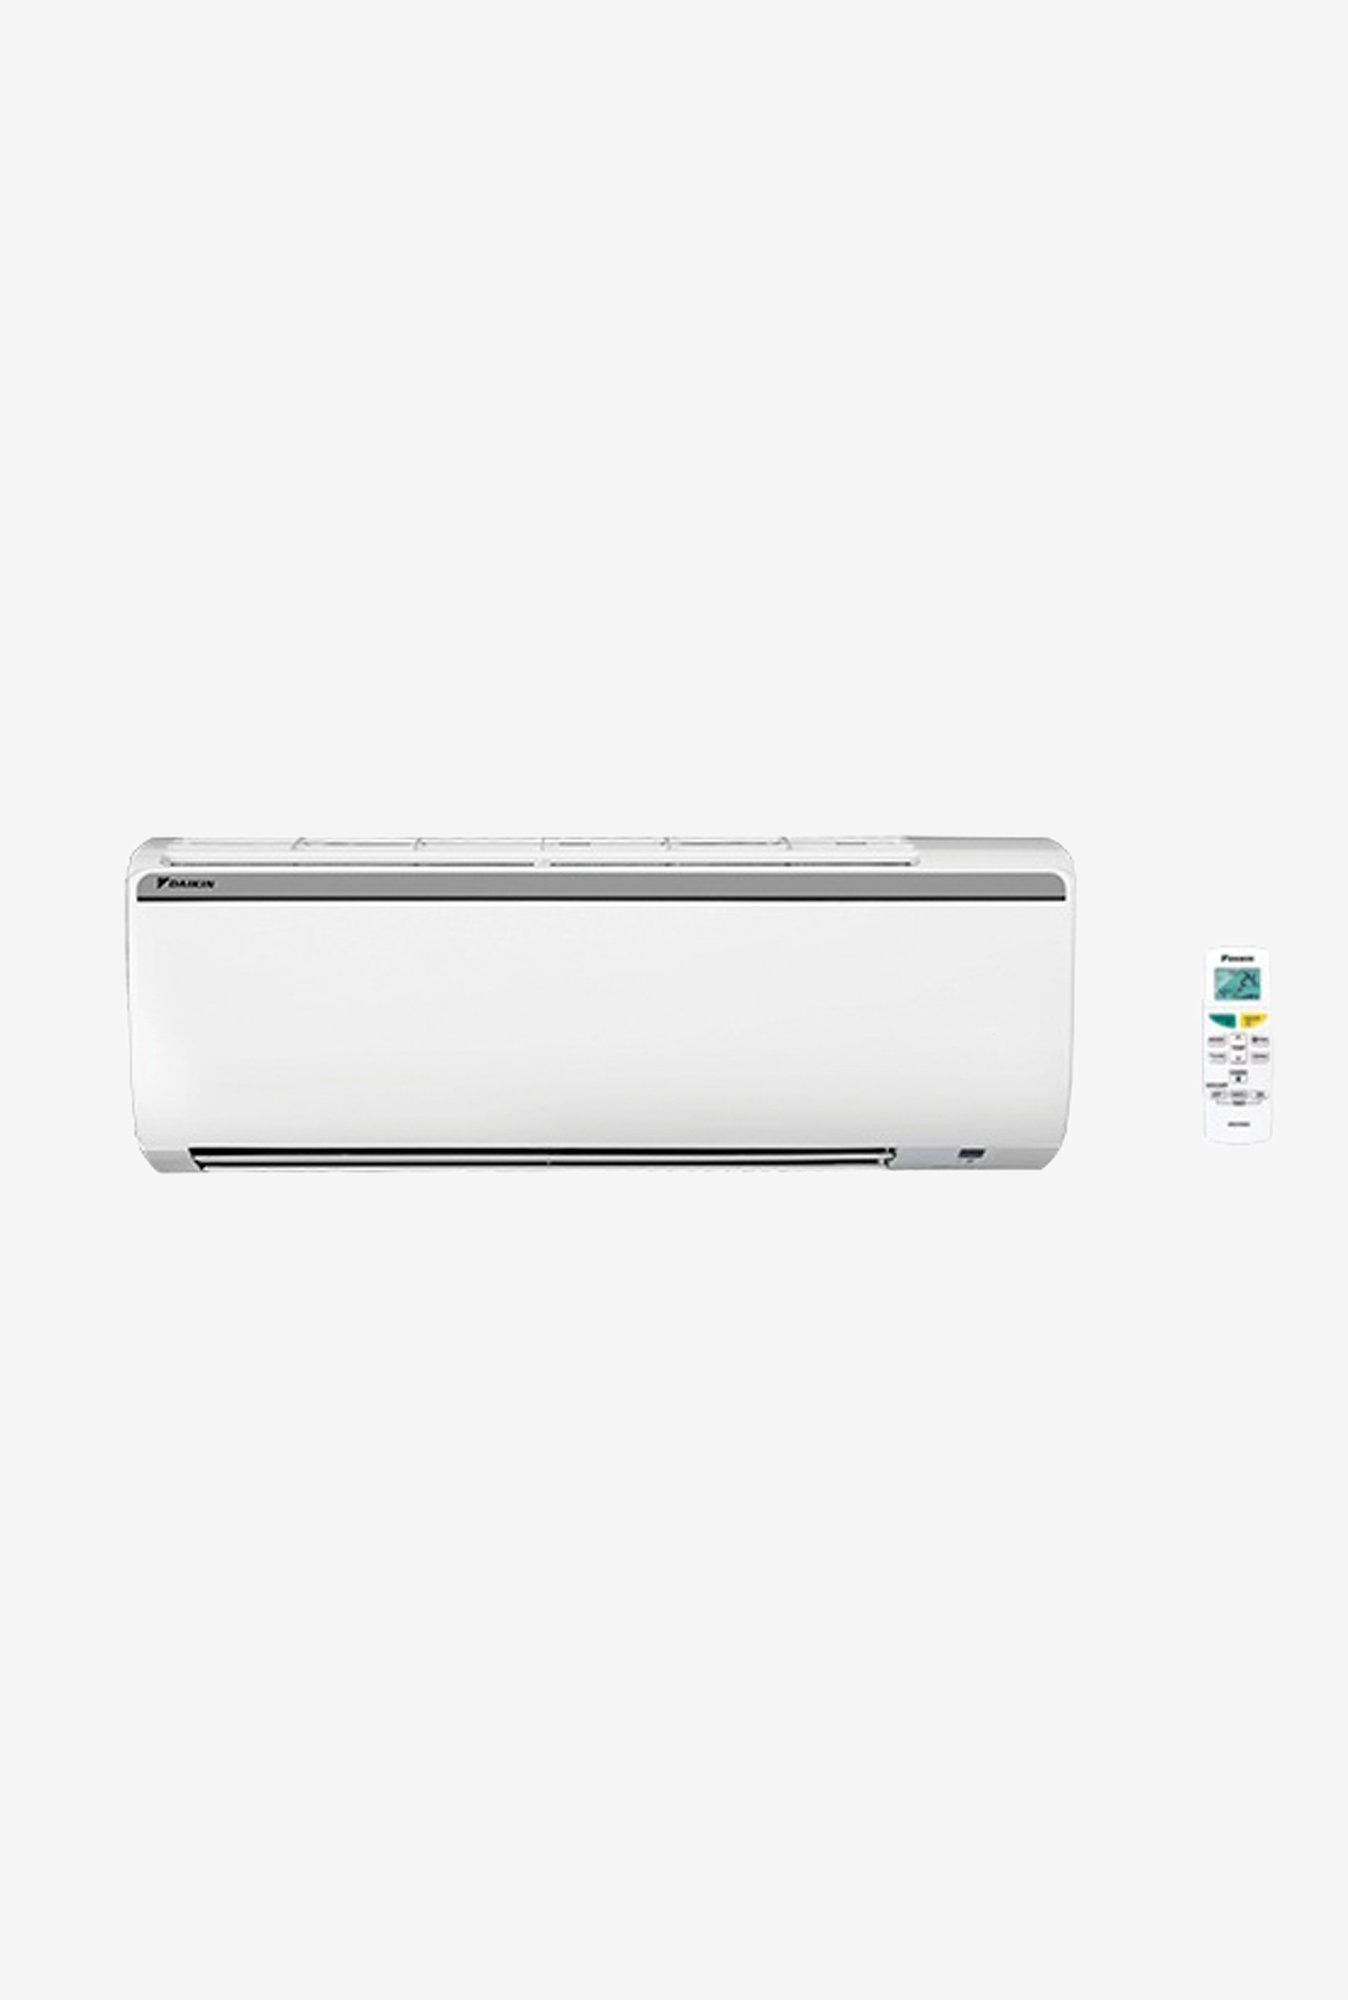 Buy DAIKIN 1 5 Ton 3 Star Copper FTL50TV16U1 Split AC (White) Online